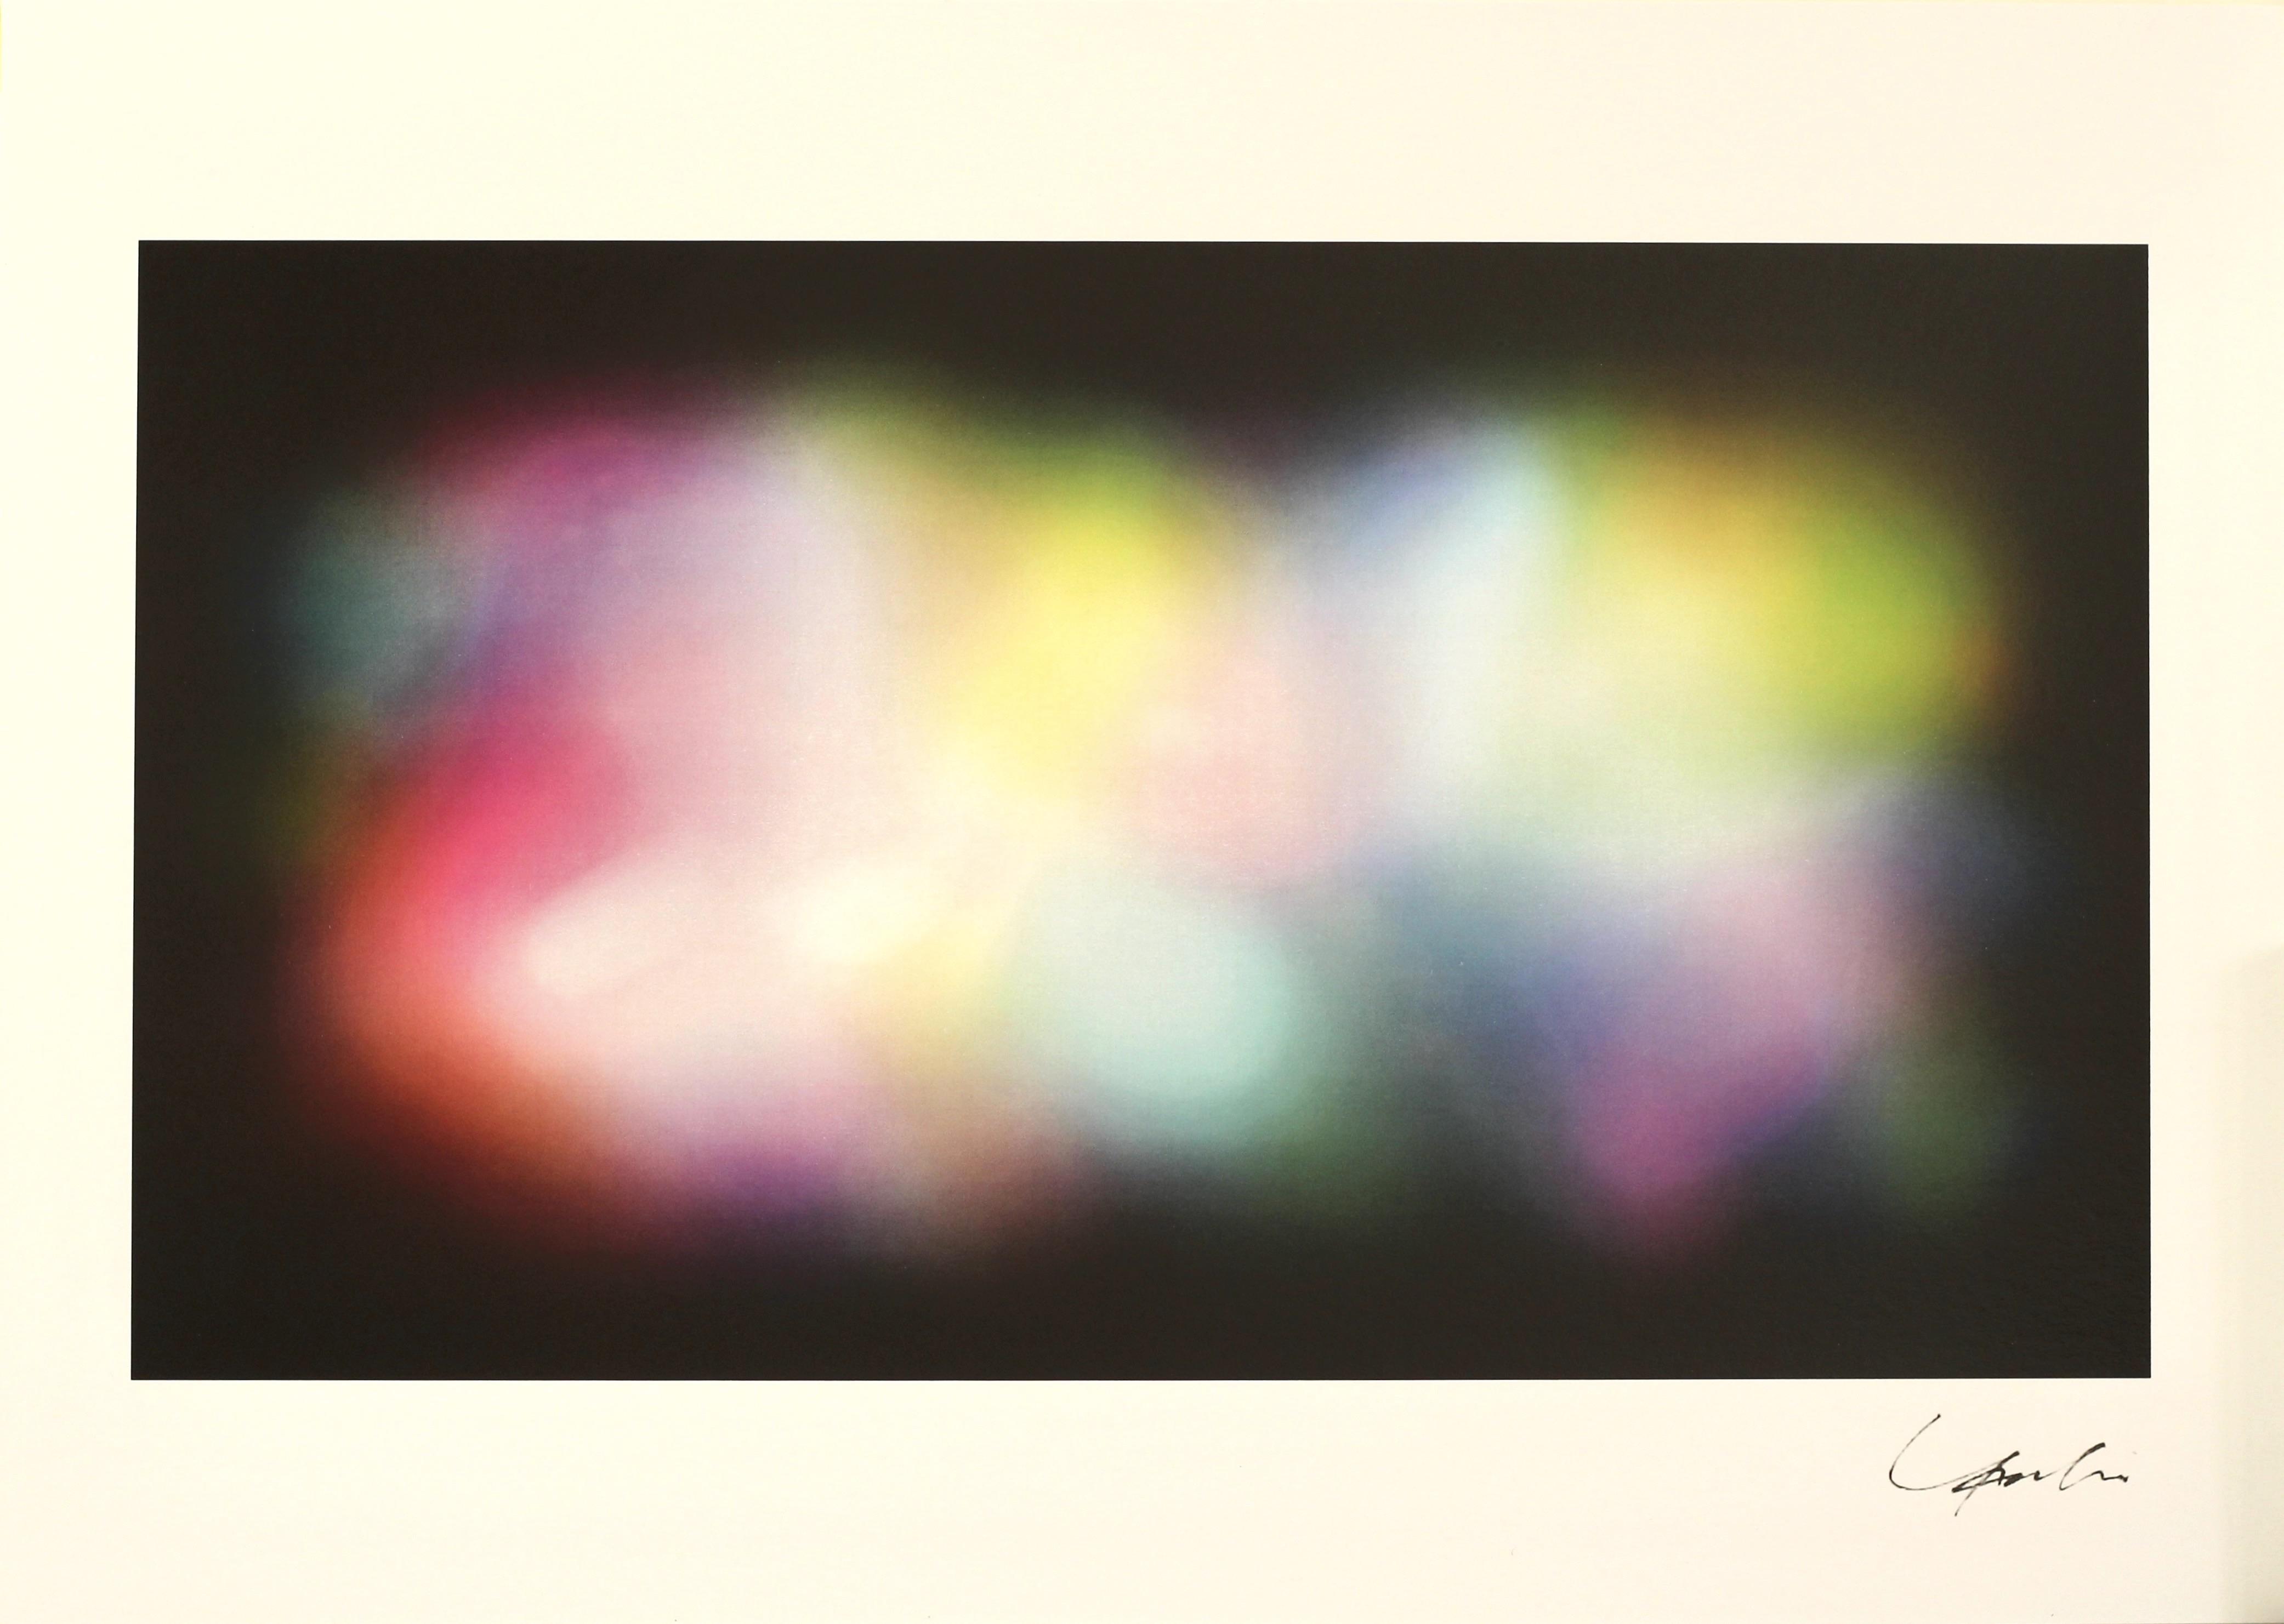 Yoshiyuki Abe, N 137, Hahnemühle Fine Art Print, 29,6 x 42 cm, Edition of 50, 2010